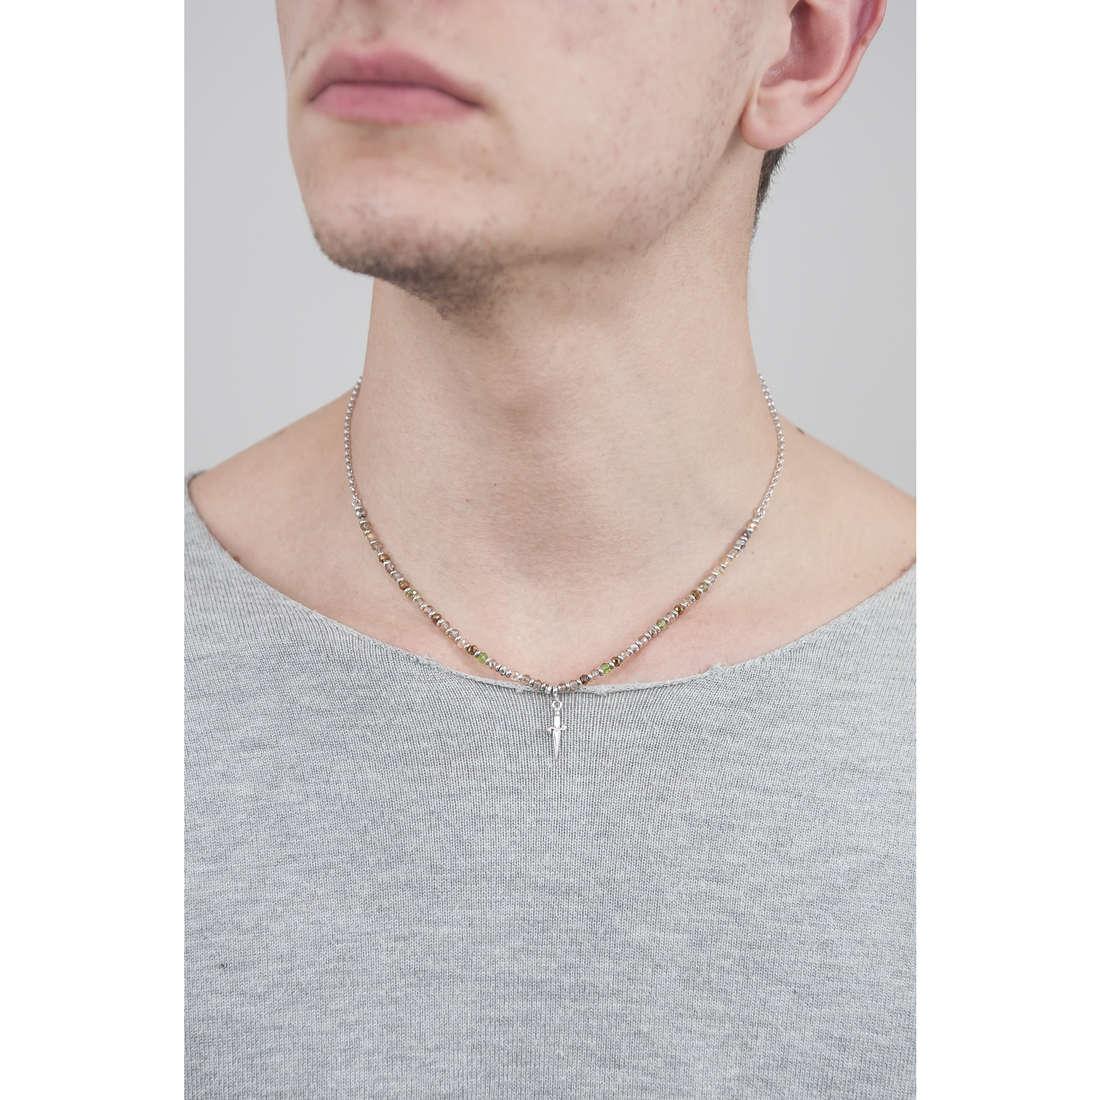 Cesare Paciotti necklaces Shade man JPCL1113B indosso